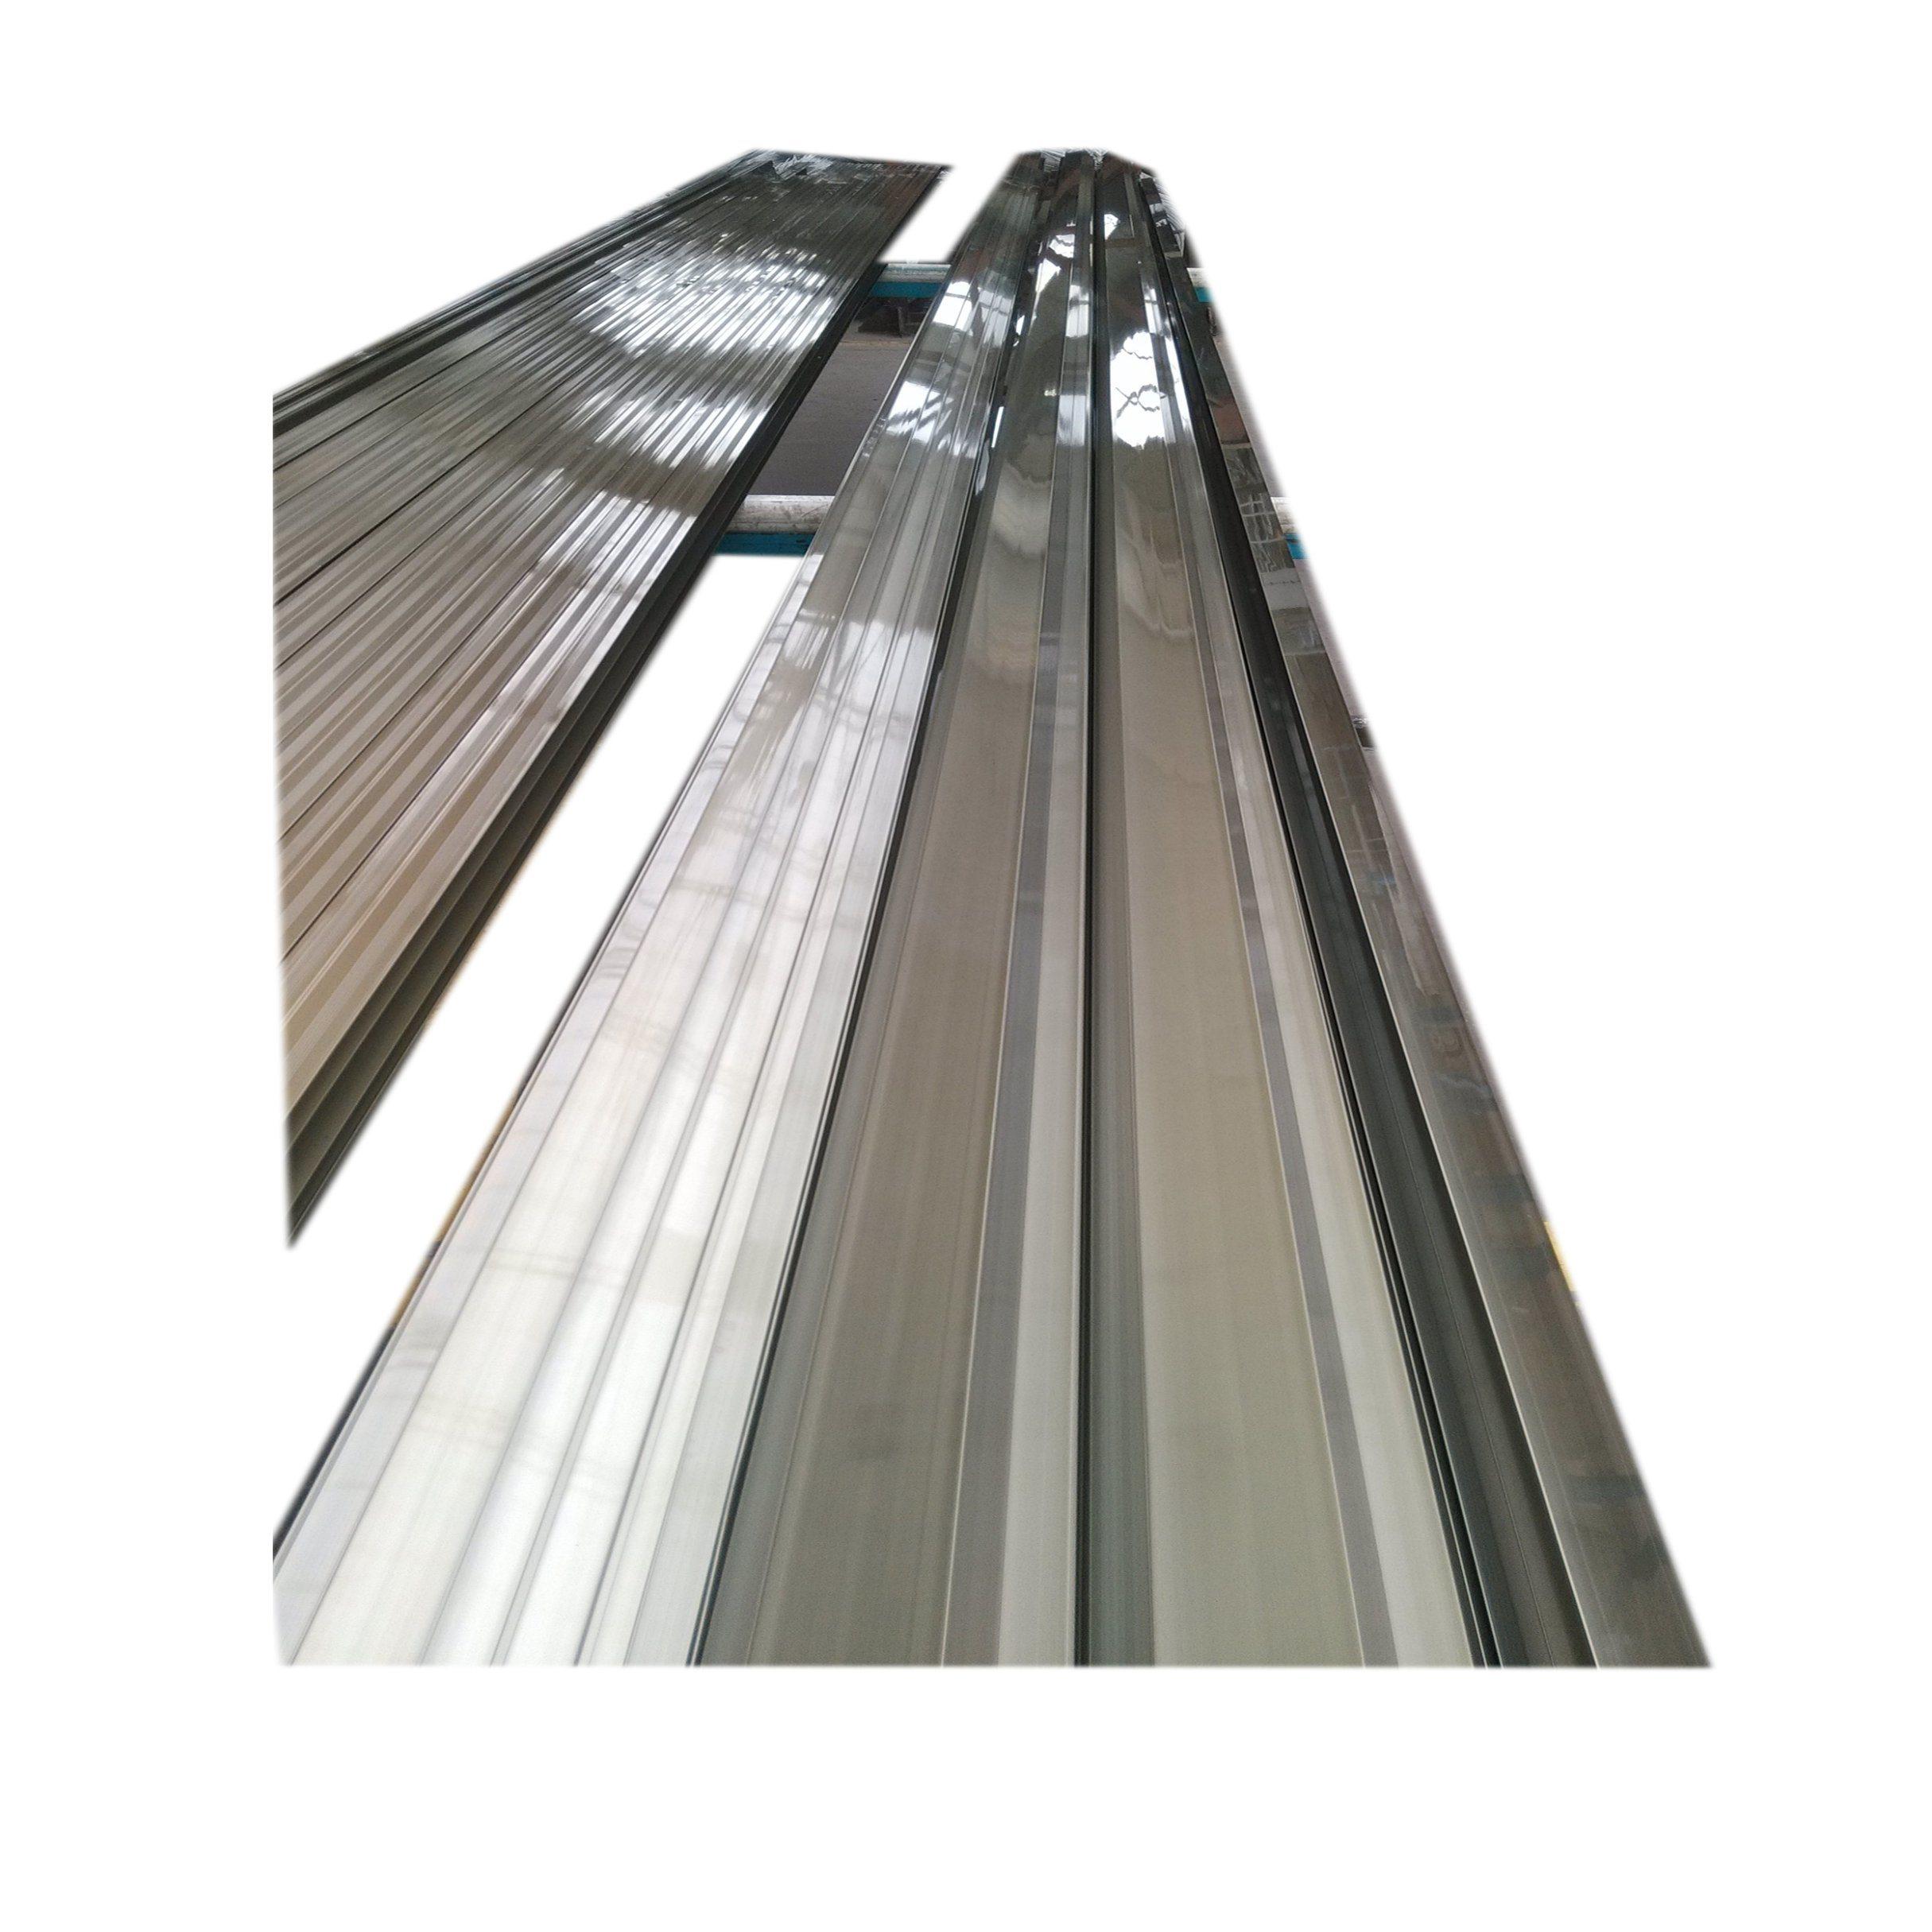 Electrophoretic Champange Aluminium Extrusion Profile for Window Door Industry